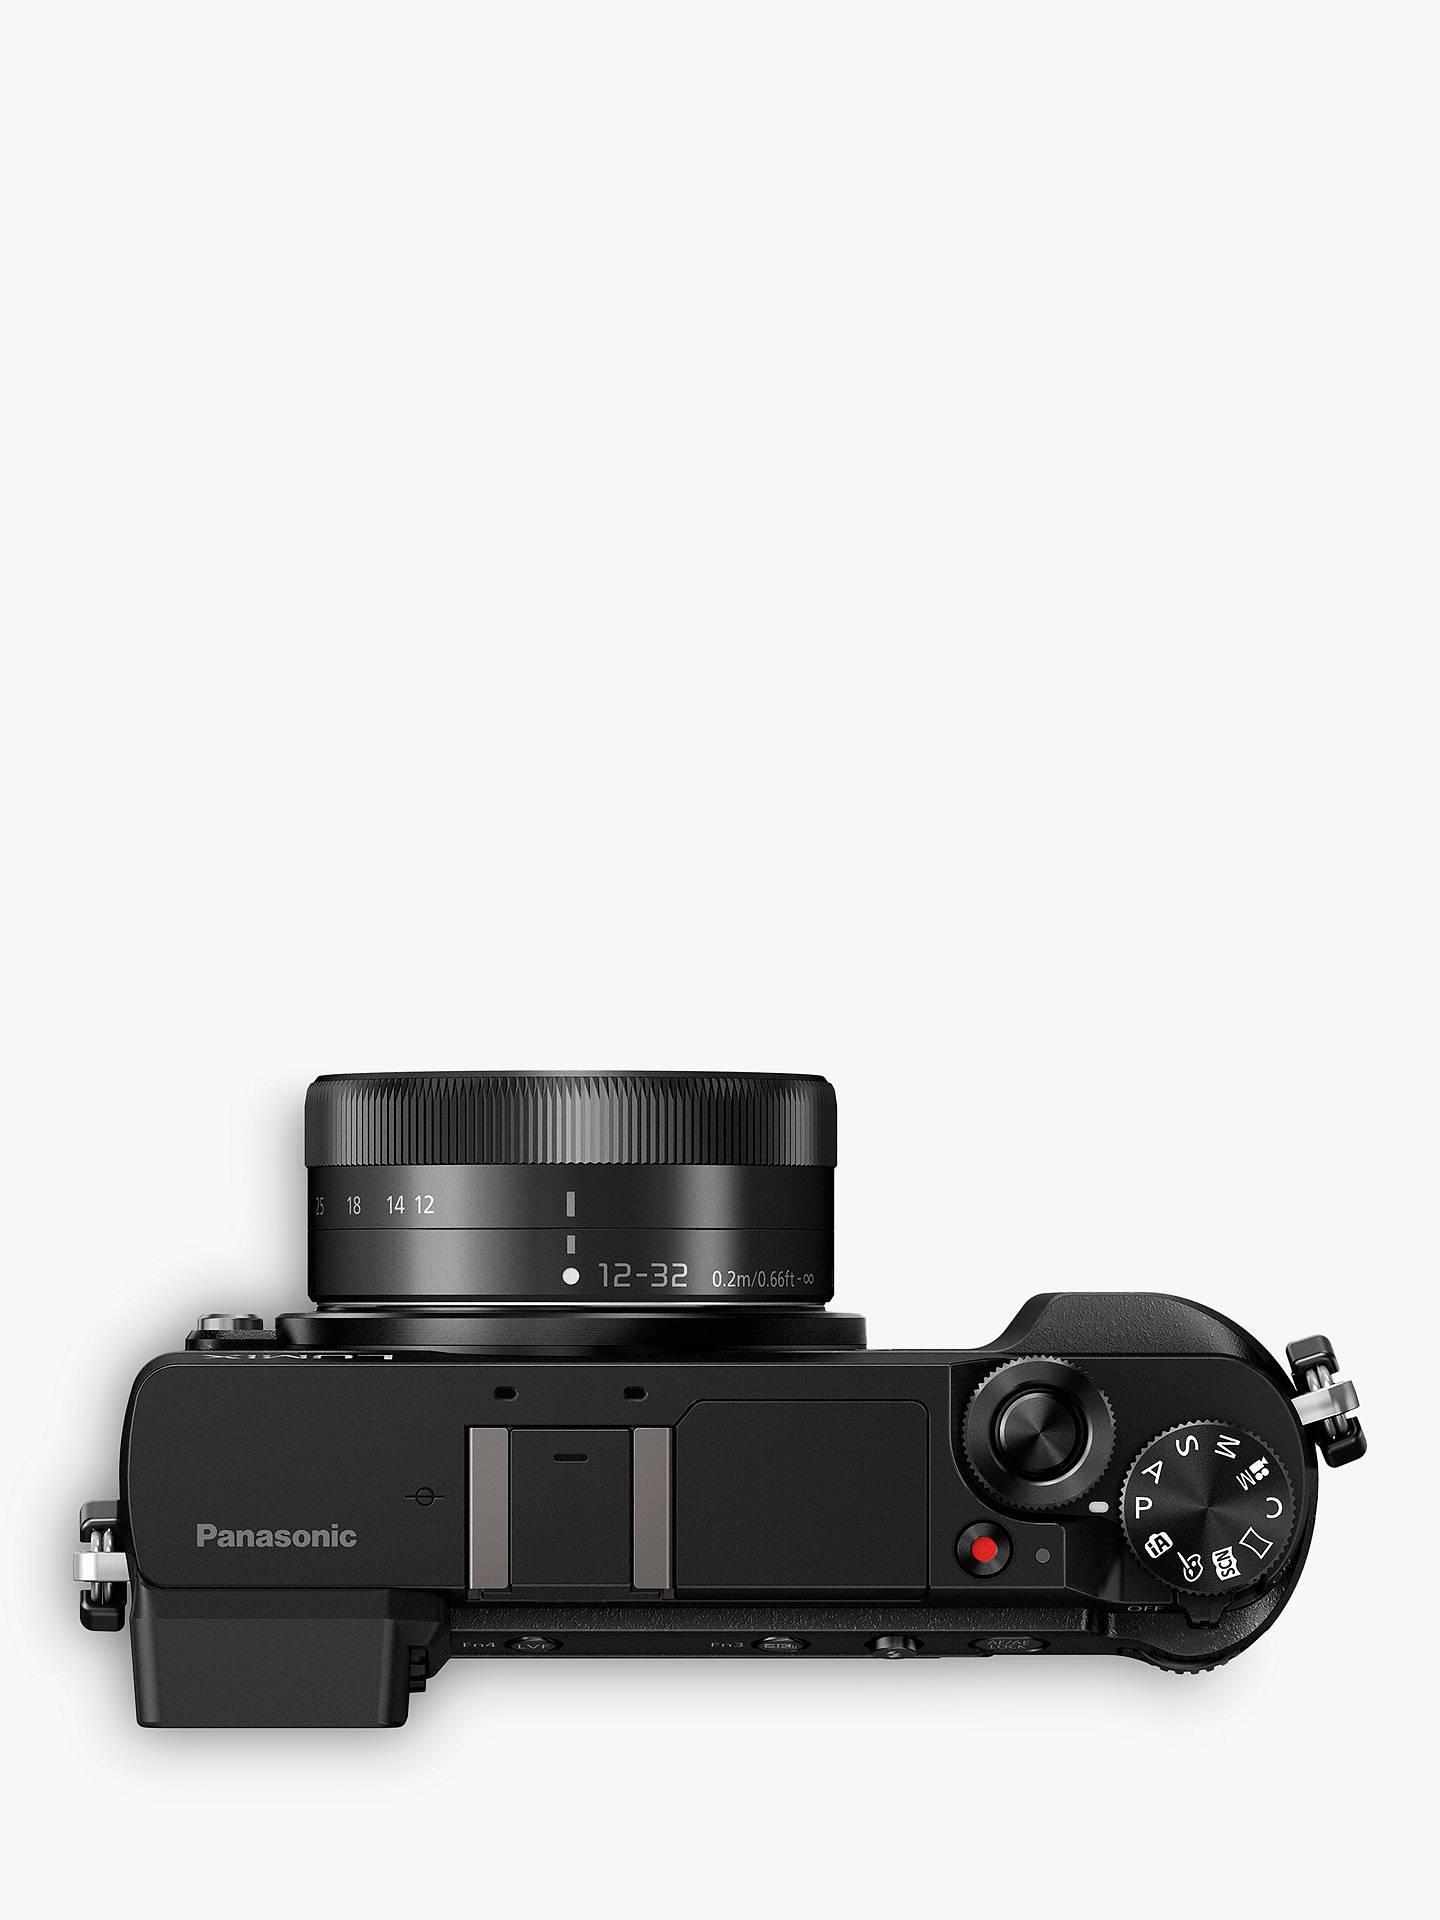 Panasonic Lumix DMC-GX80 Compact System Camera with 12-32mm Interchangable  Lens, 4K Ultra HD, 16MP, 4x Digital Zoom, Wi-Fi, 3